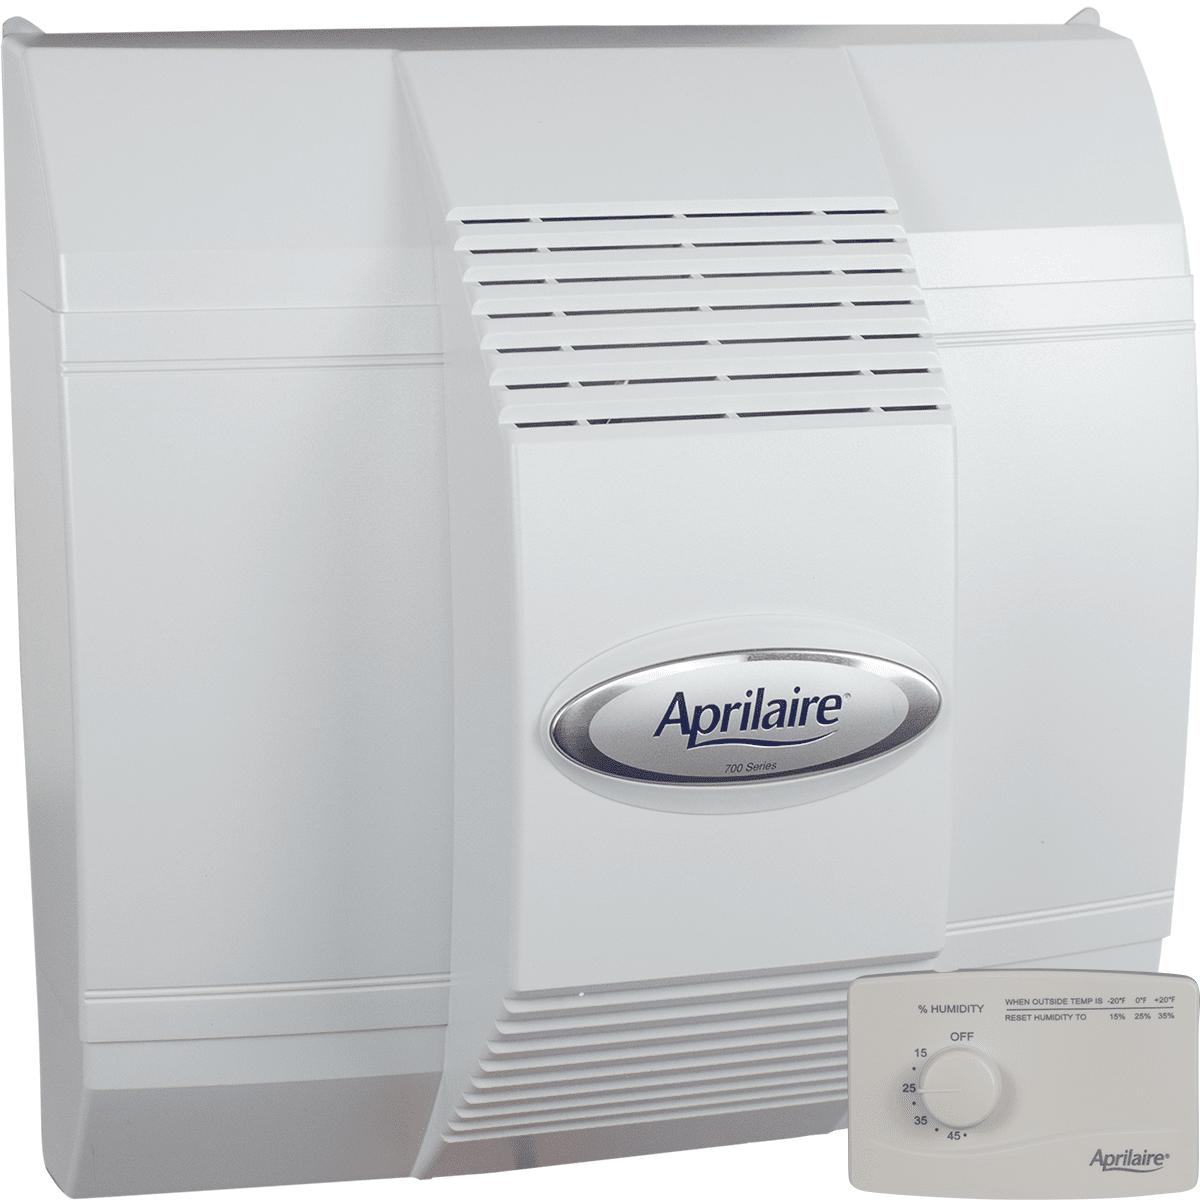 Aprilaire Model 700 High-capacity Humidifier - Manual Control